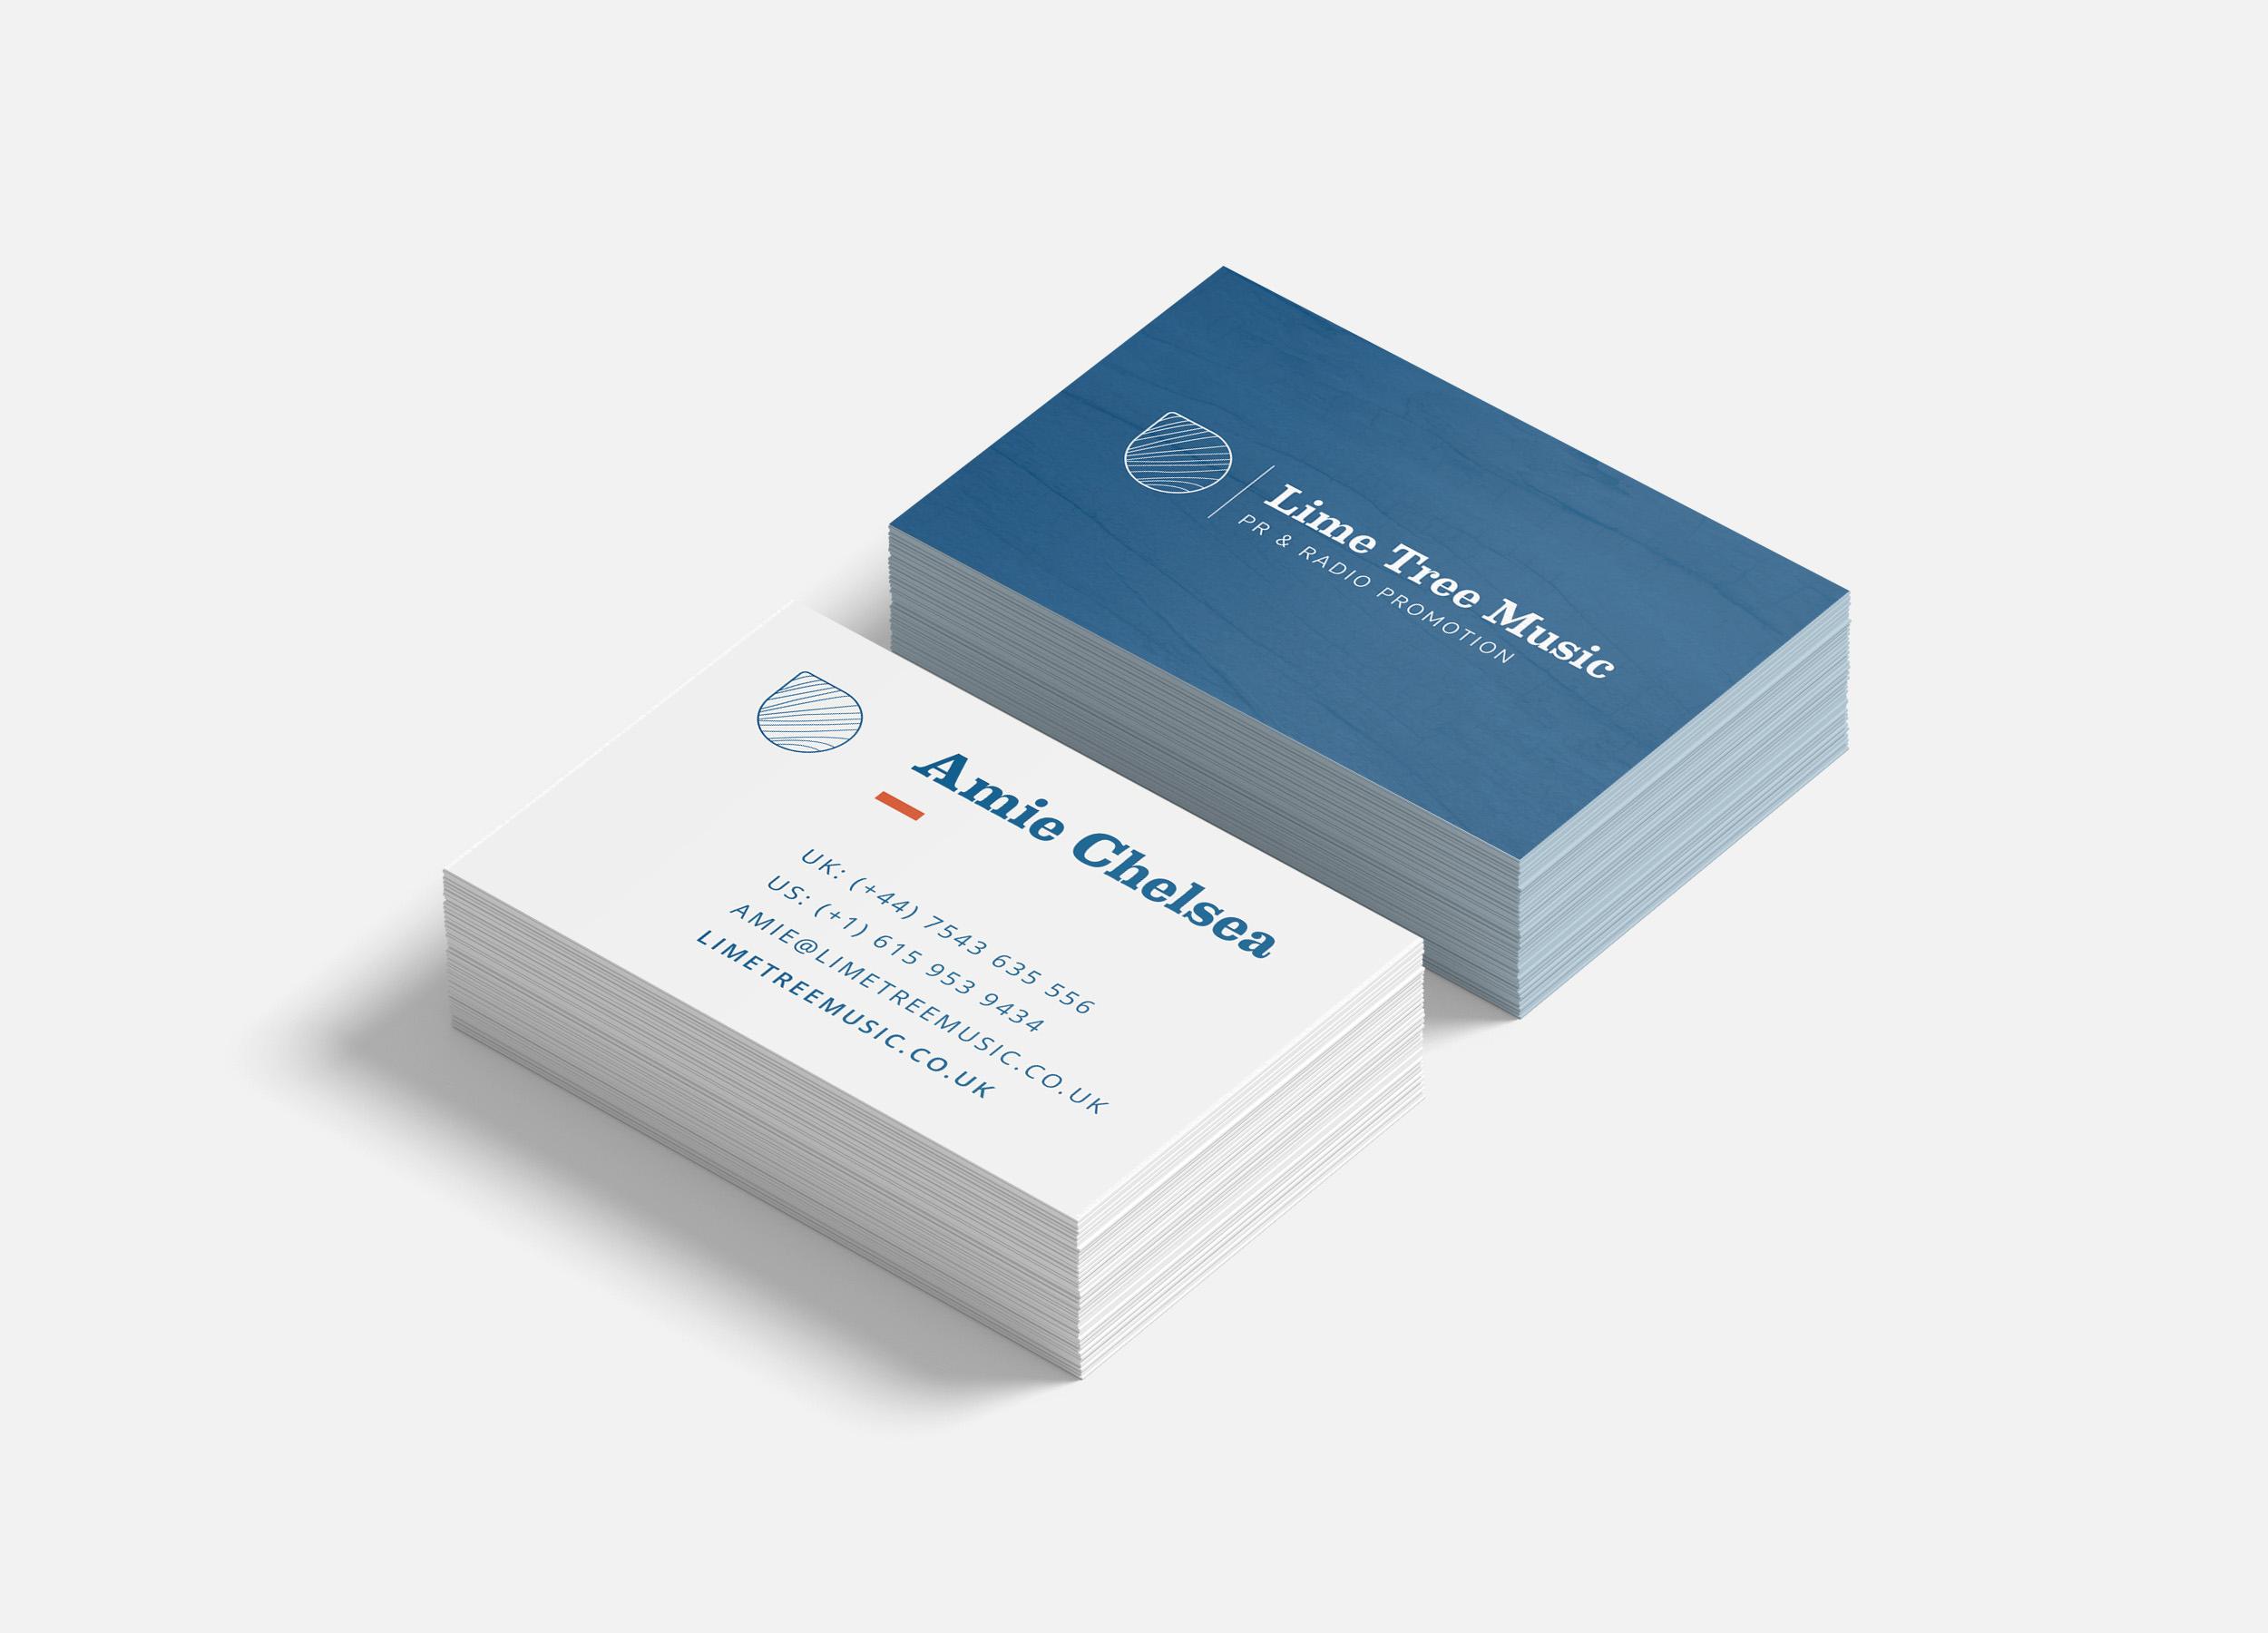 Limetree_Mockup2_Business_Card.jpg